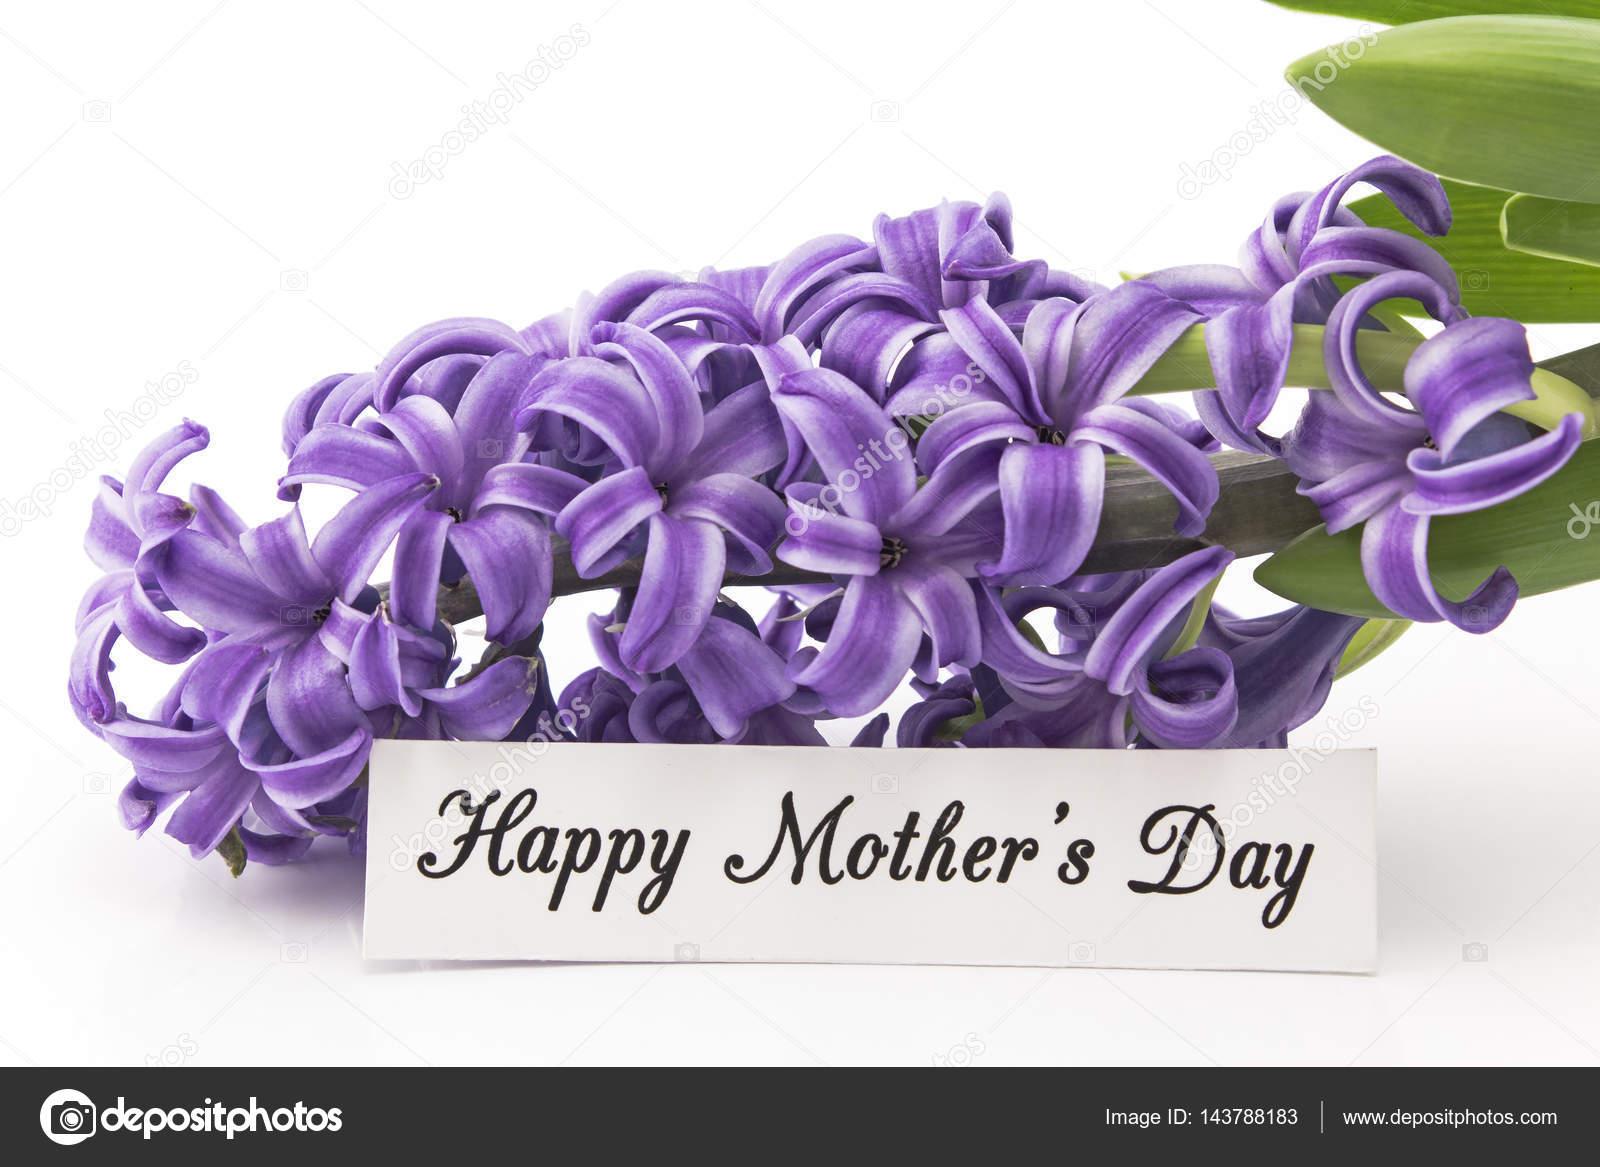 Happy Mothers Day Greeting Card Stock Photo Simonida 143788183